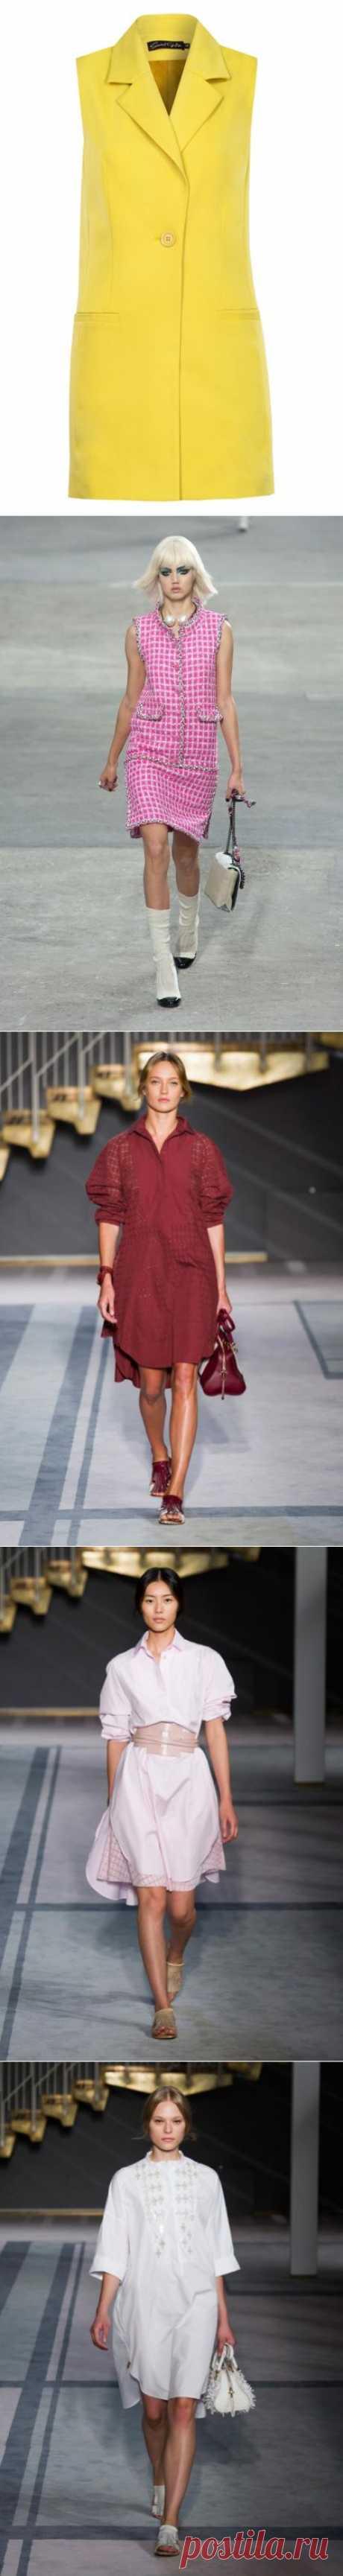 Shirt dress: trend of a summer season: Beauty: World of the woman: Subscribe.Ru